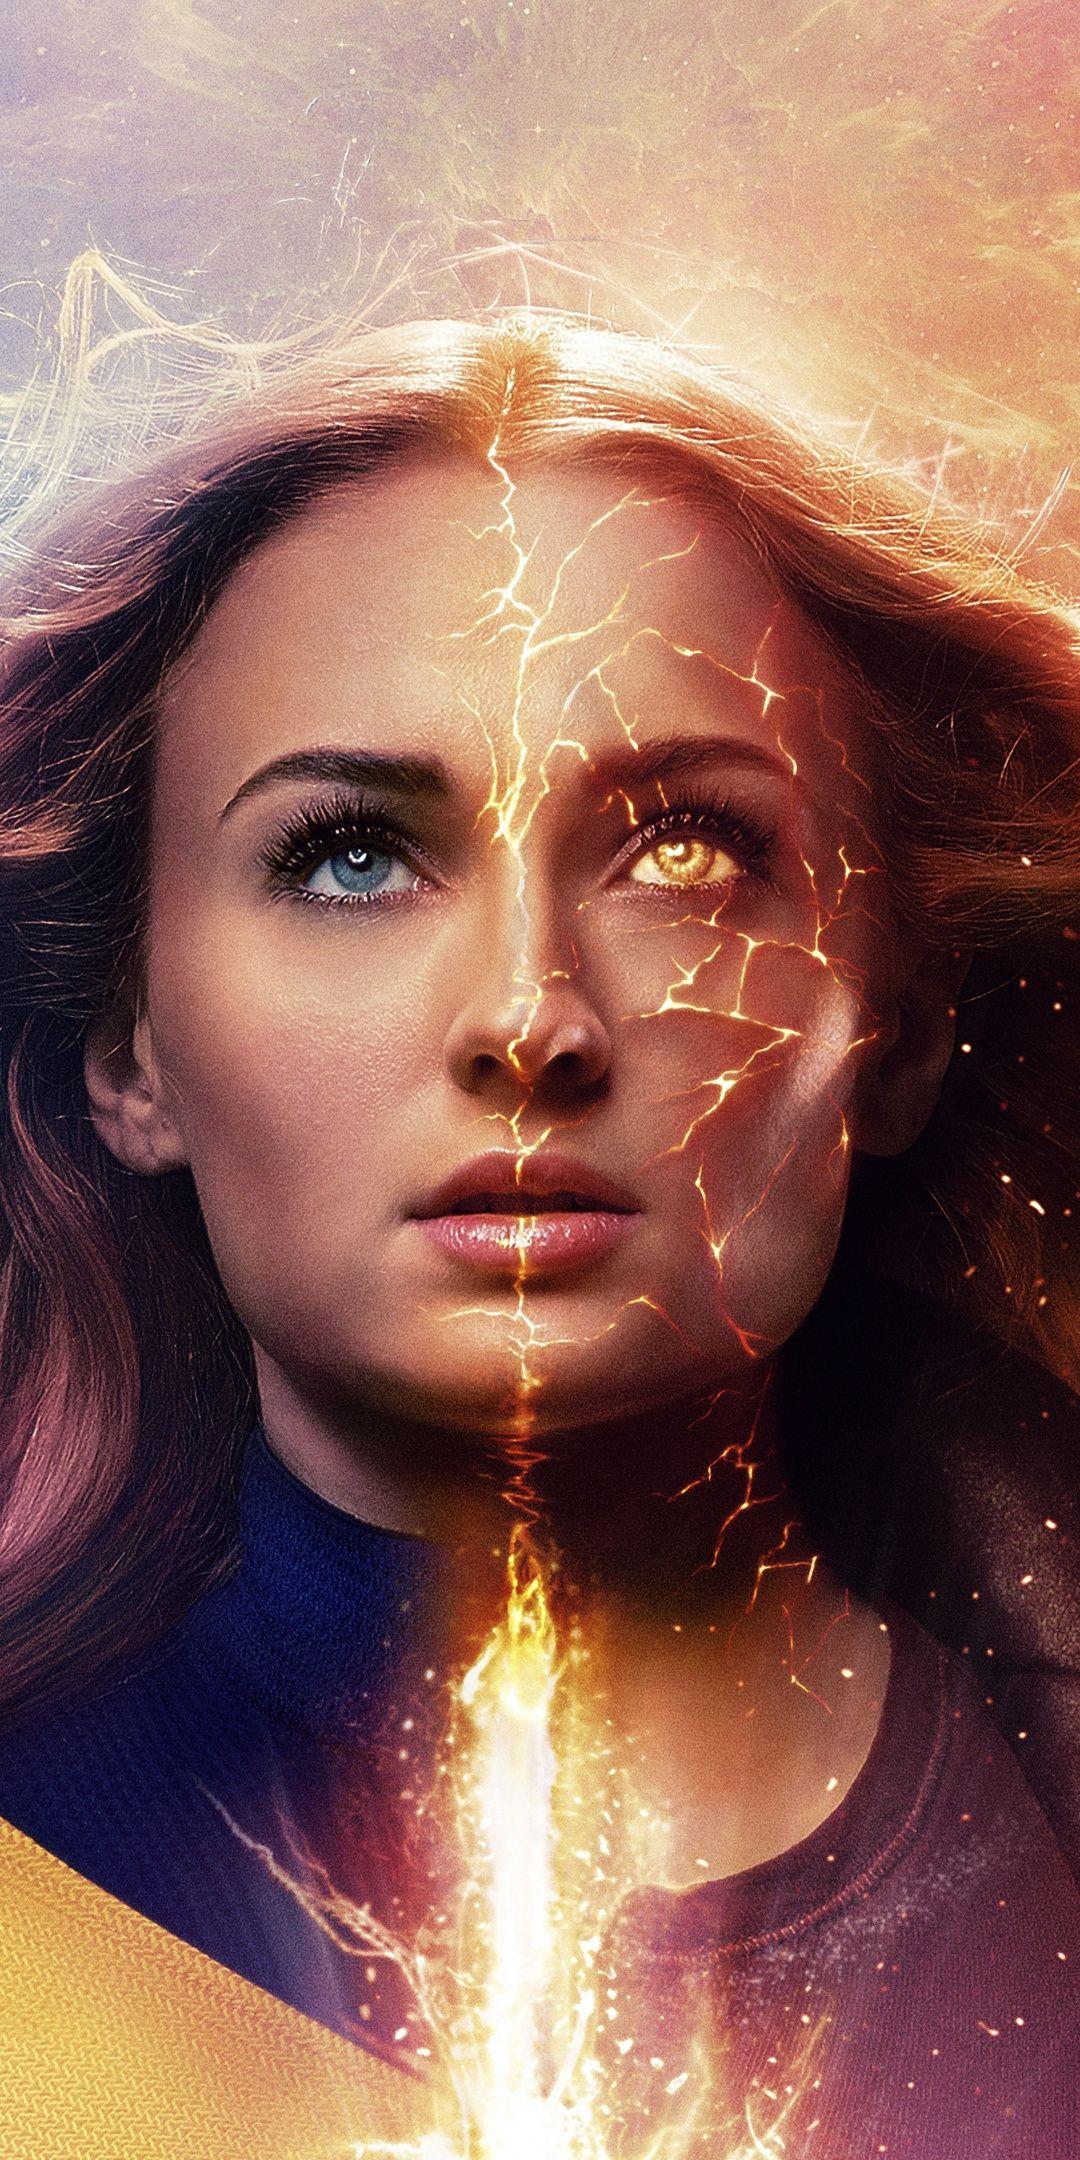 1080x2160 Dark Phoenix Jean Grey X Men Sophie Turner Wallpaper Marvel Jean Grey Dark Phoenix Jean Grey